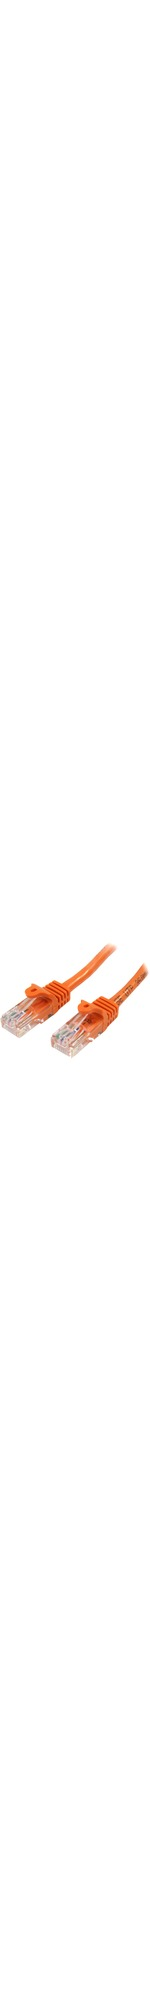 StarTech.com 2m Orange Cat5e Snagless RJ45 UTP Patch Cable - 2m Patch Cord - 1 x RJ-45 Male Network